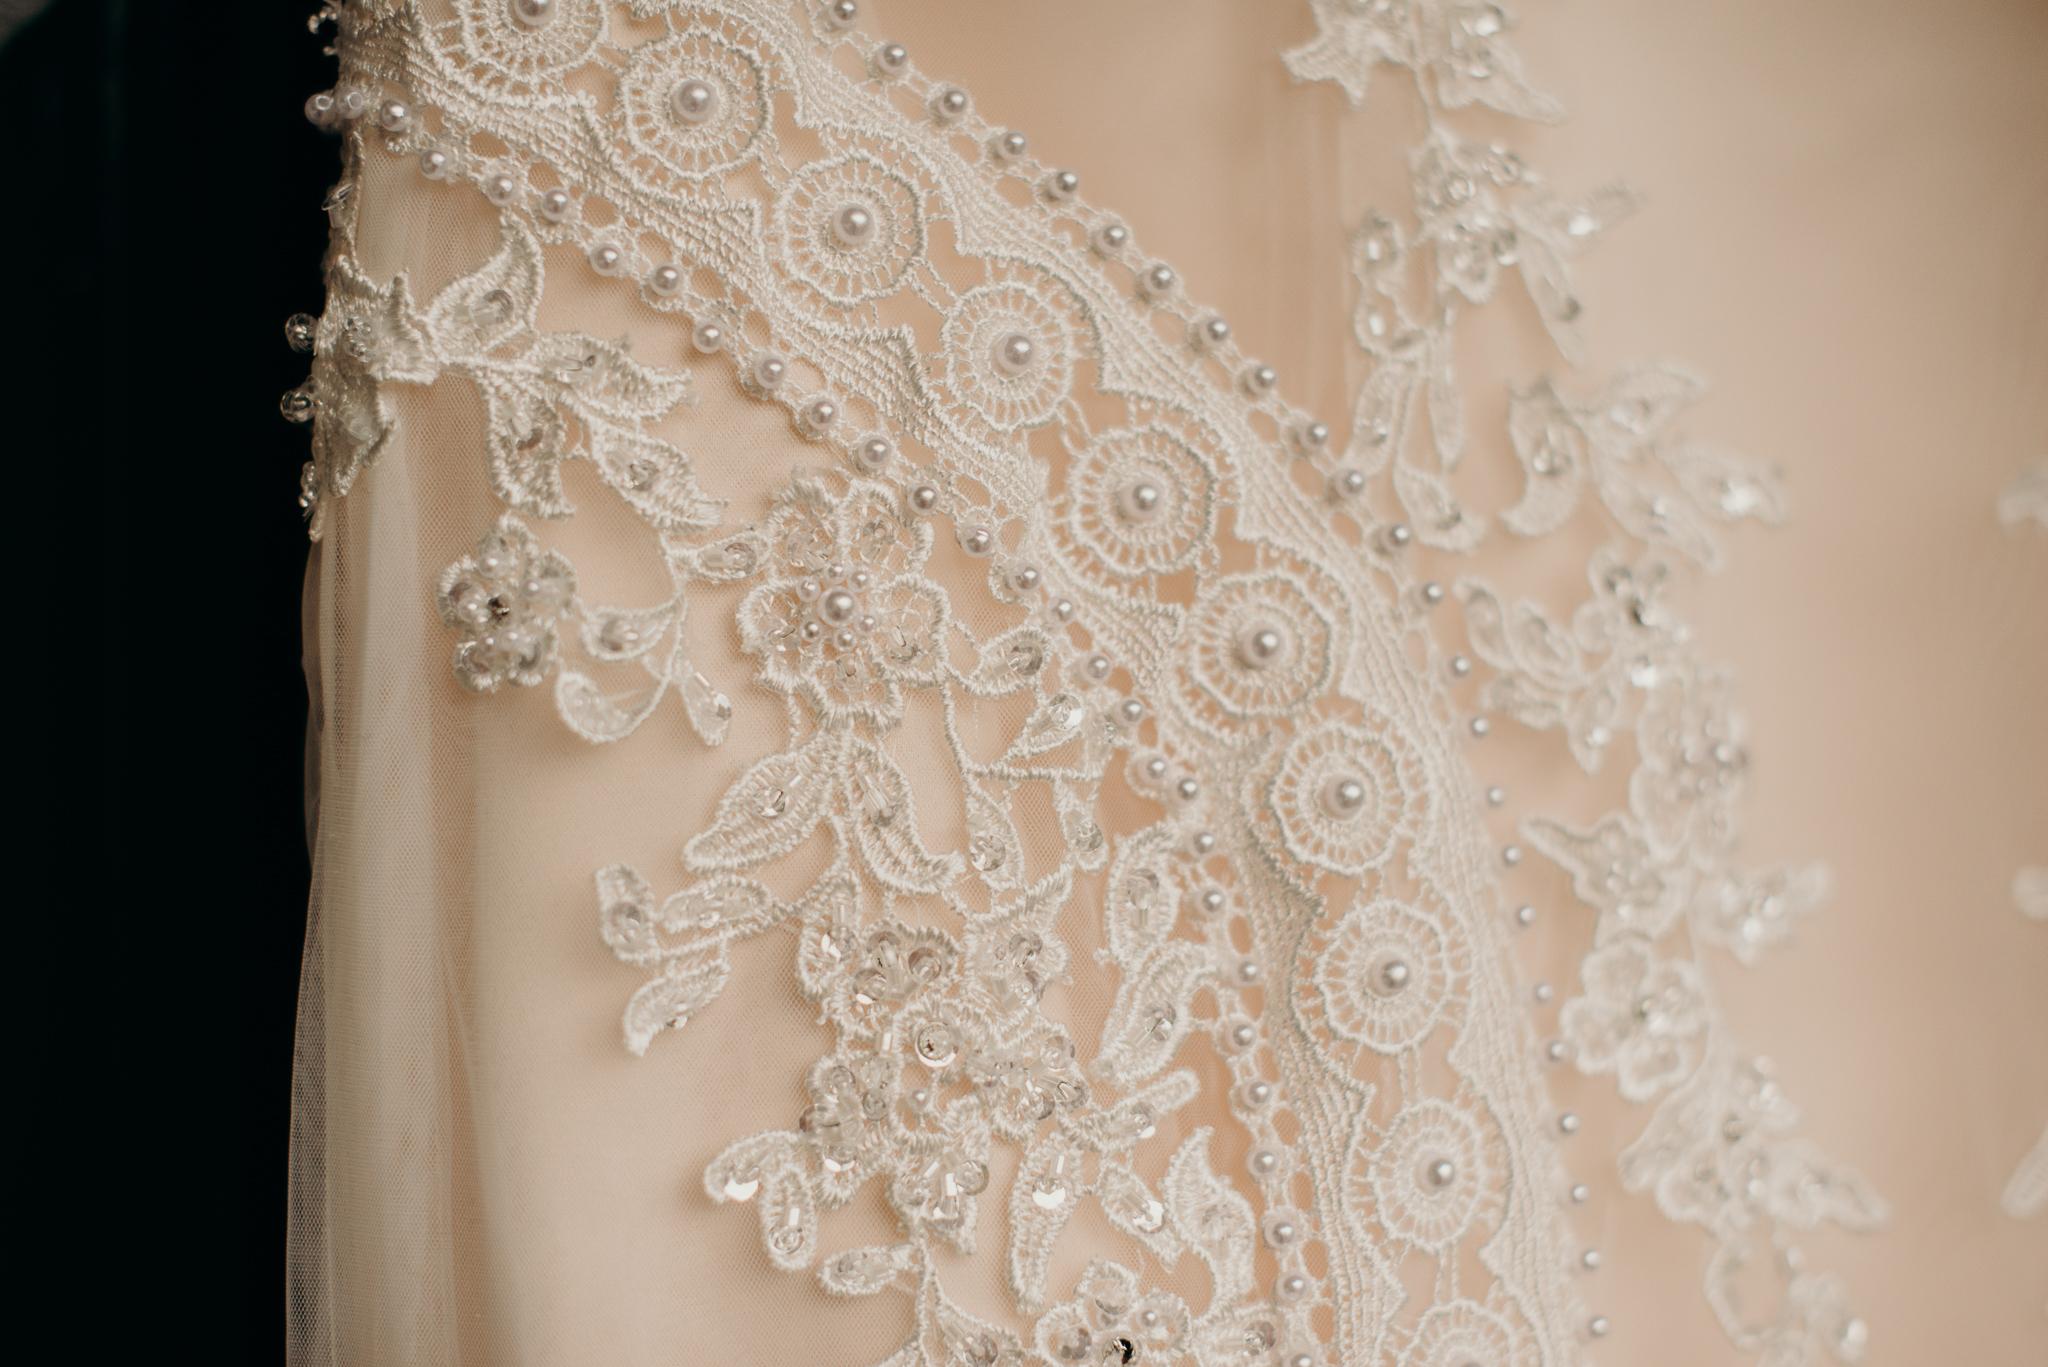 Tauranga-Coromandel-Elegant-Wedding-Photographer-Charlemagne-Lodge-9.jpg